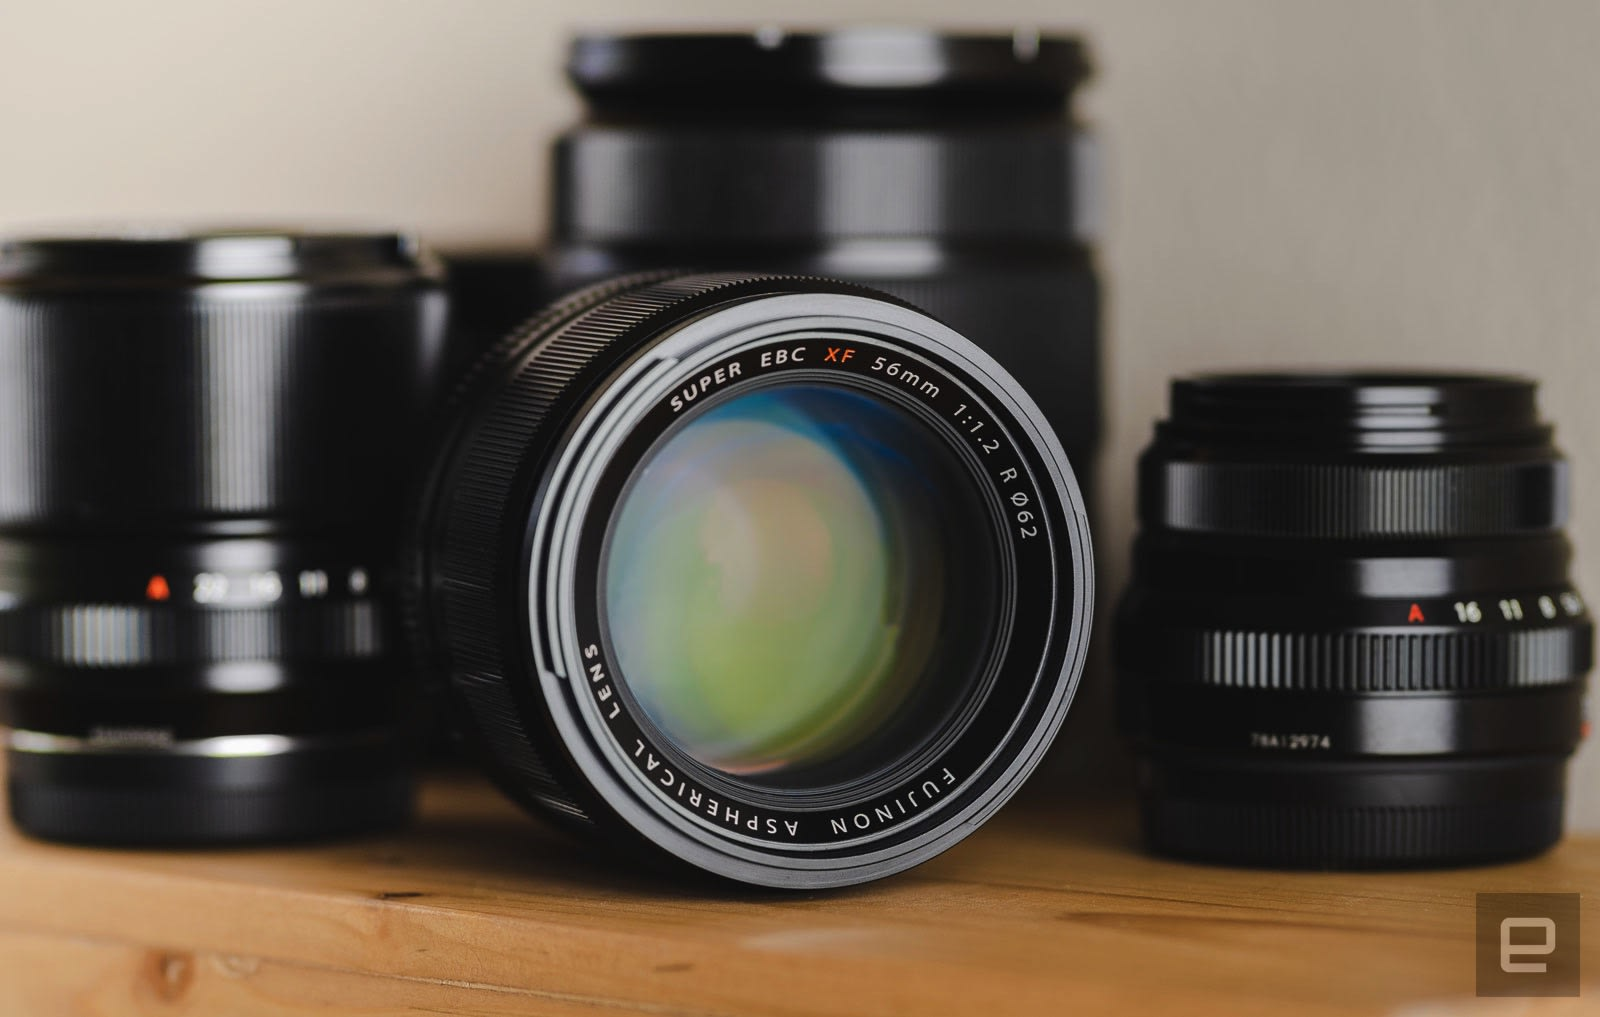 The best lenses for Fujifilm X mount